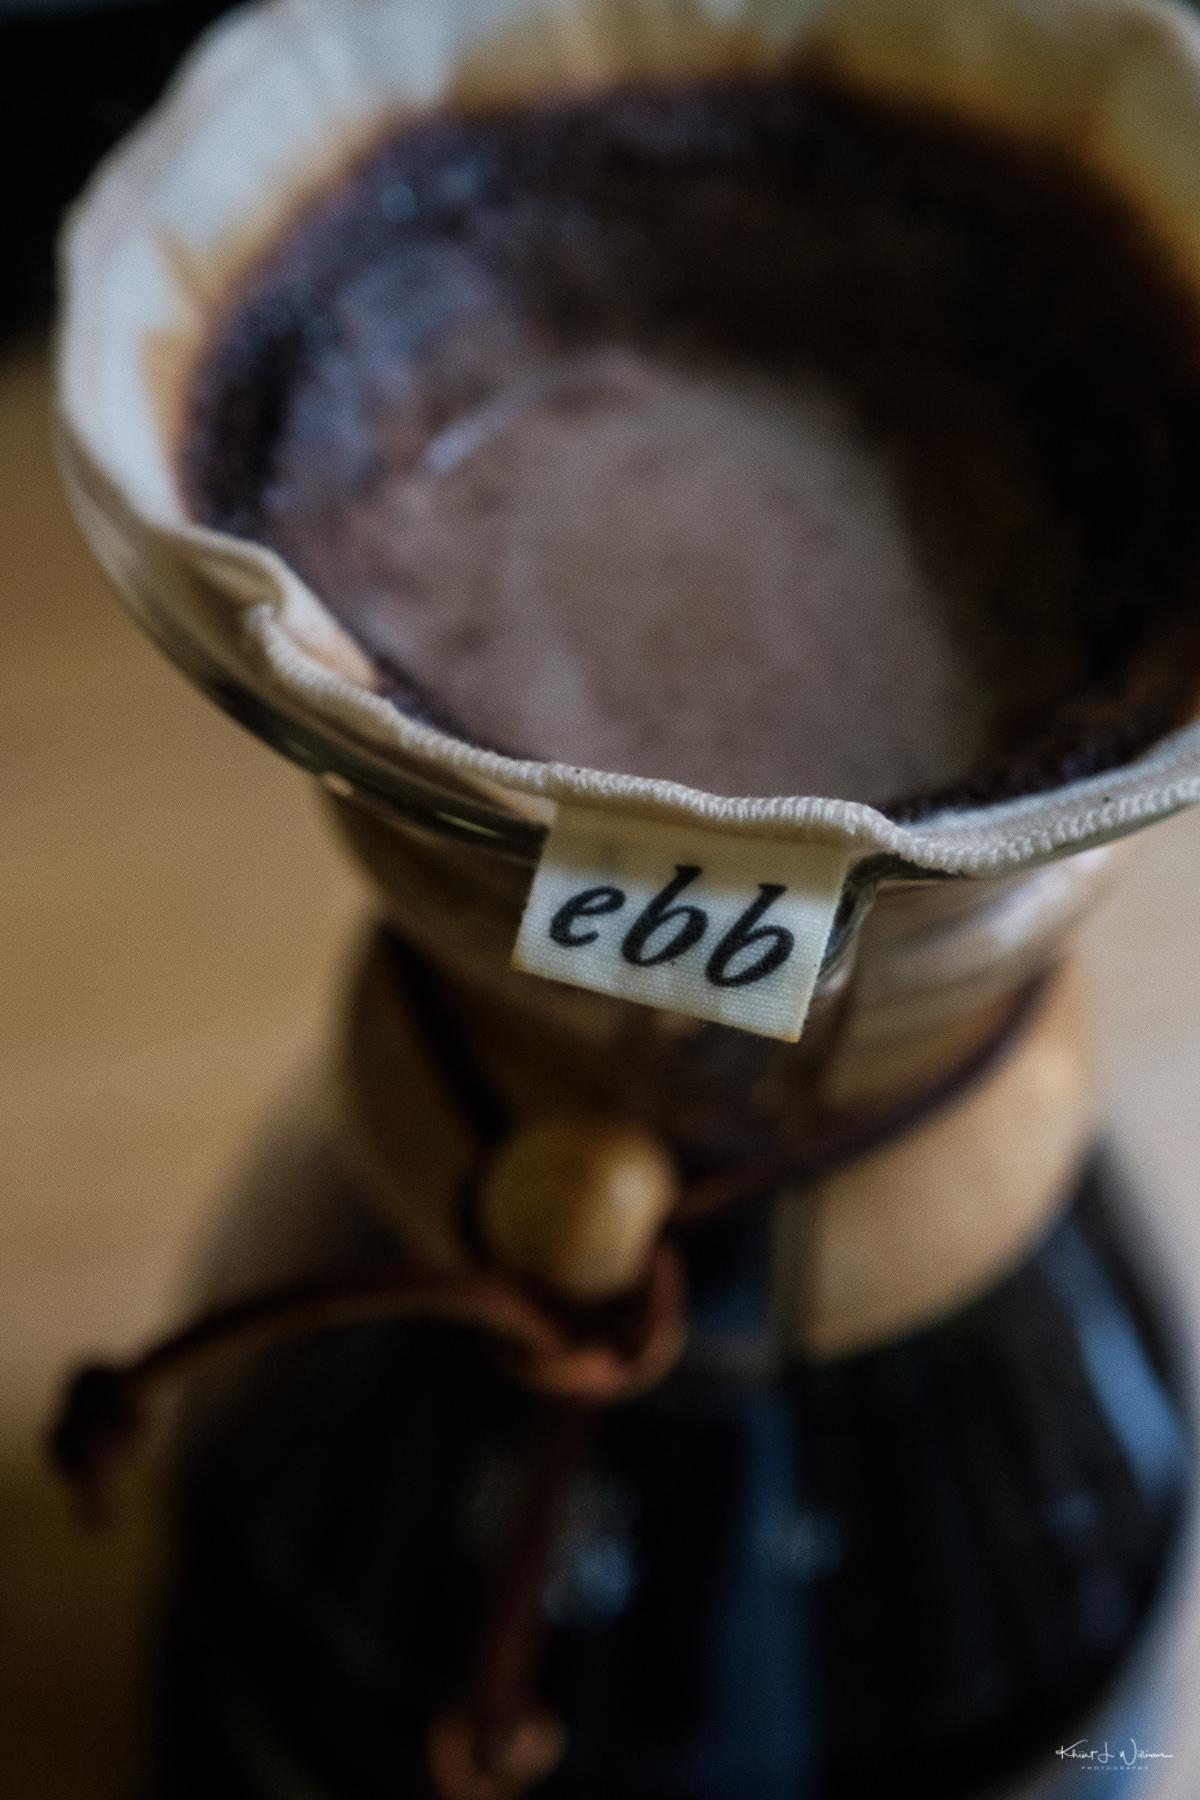 <span class='p-name'>Ebb Coffee Filter for Chemex</span>